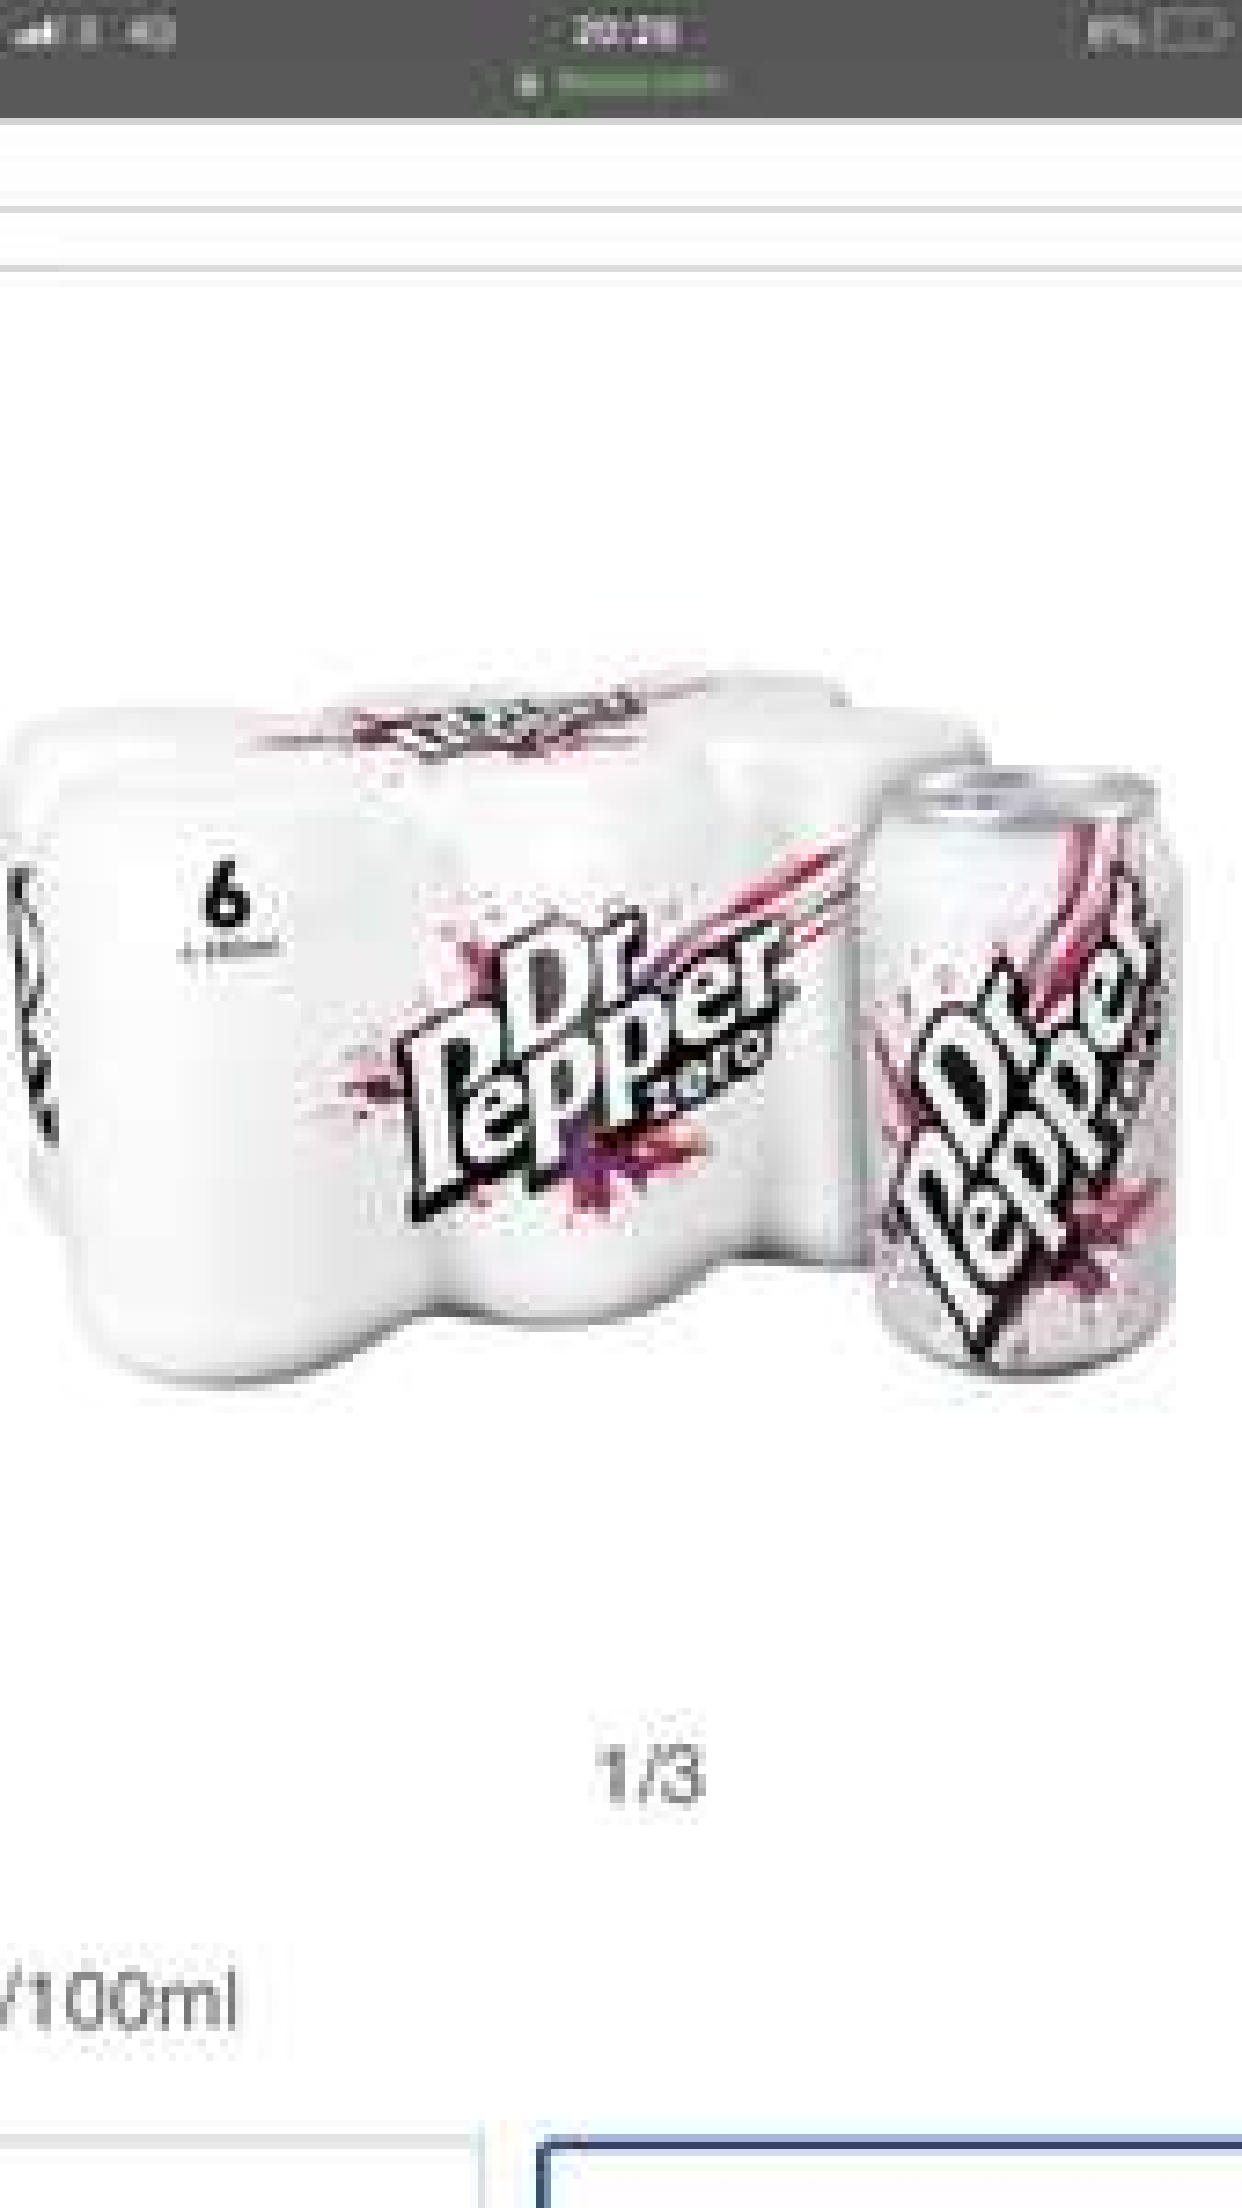 6 Pack of Dr pepper/Lilt/Fanta Half Price £1.77 was £3.55 regular & sugar free @ Tesco